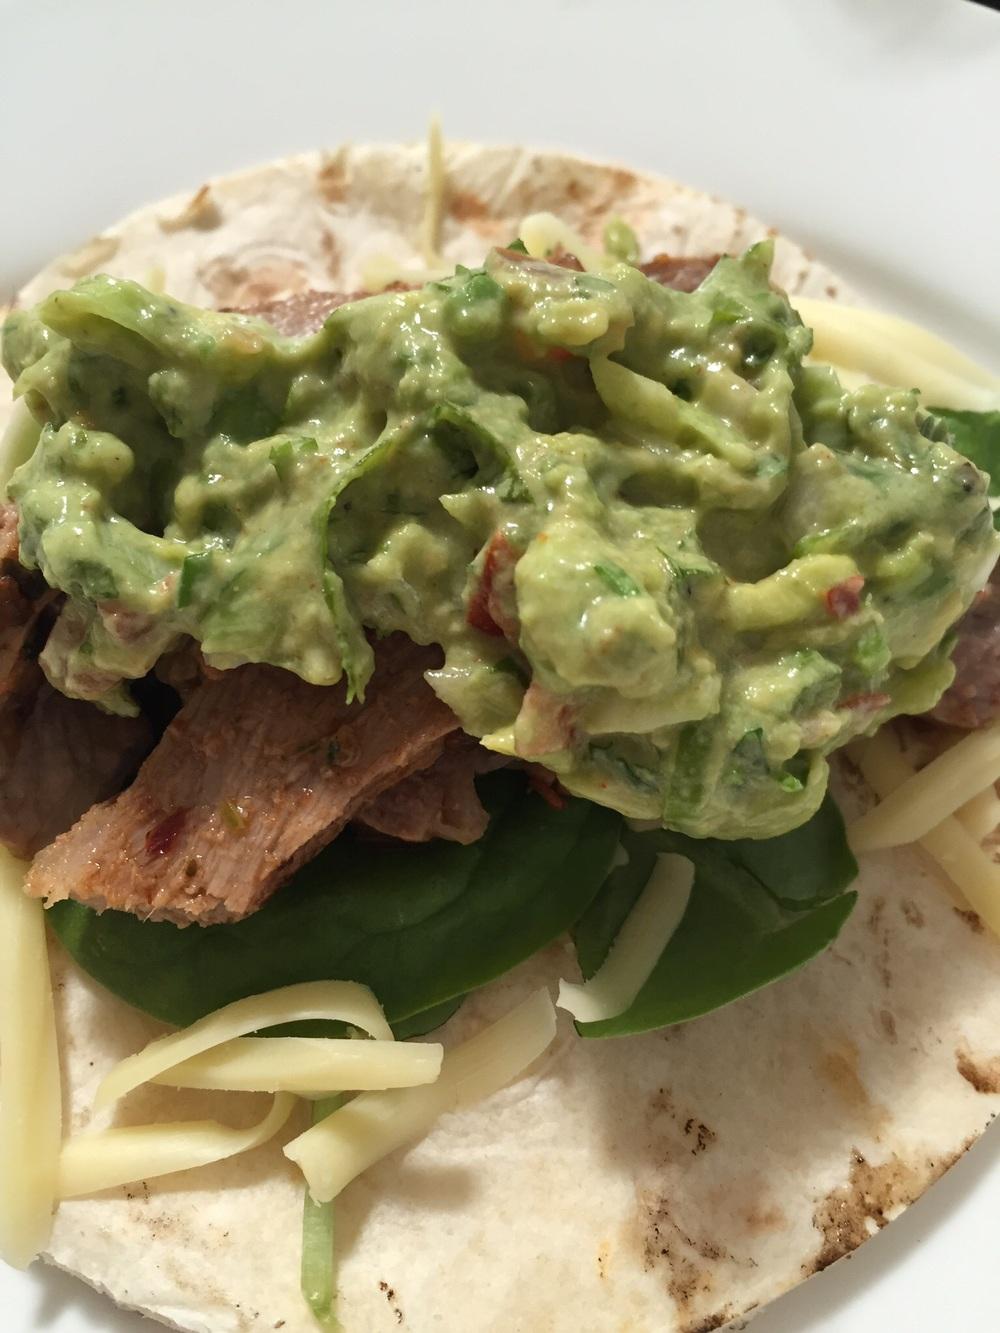 Soft taco - both delicious